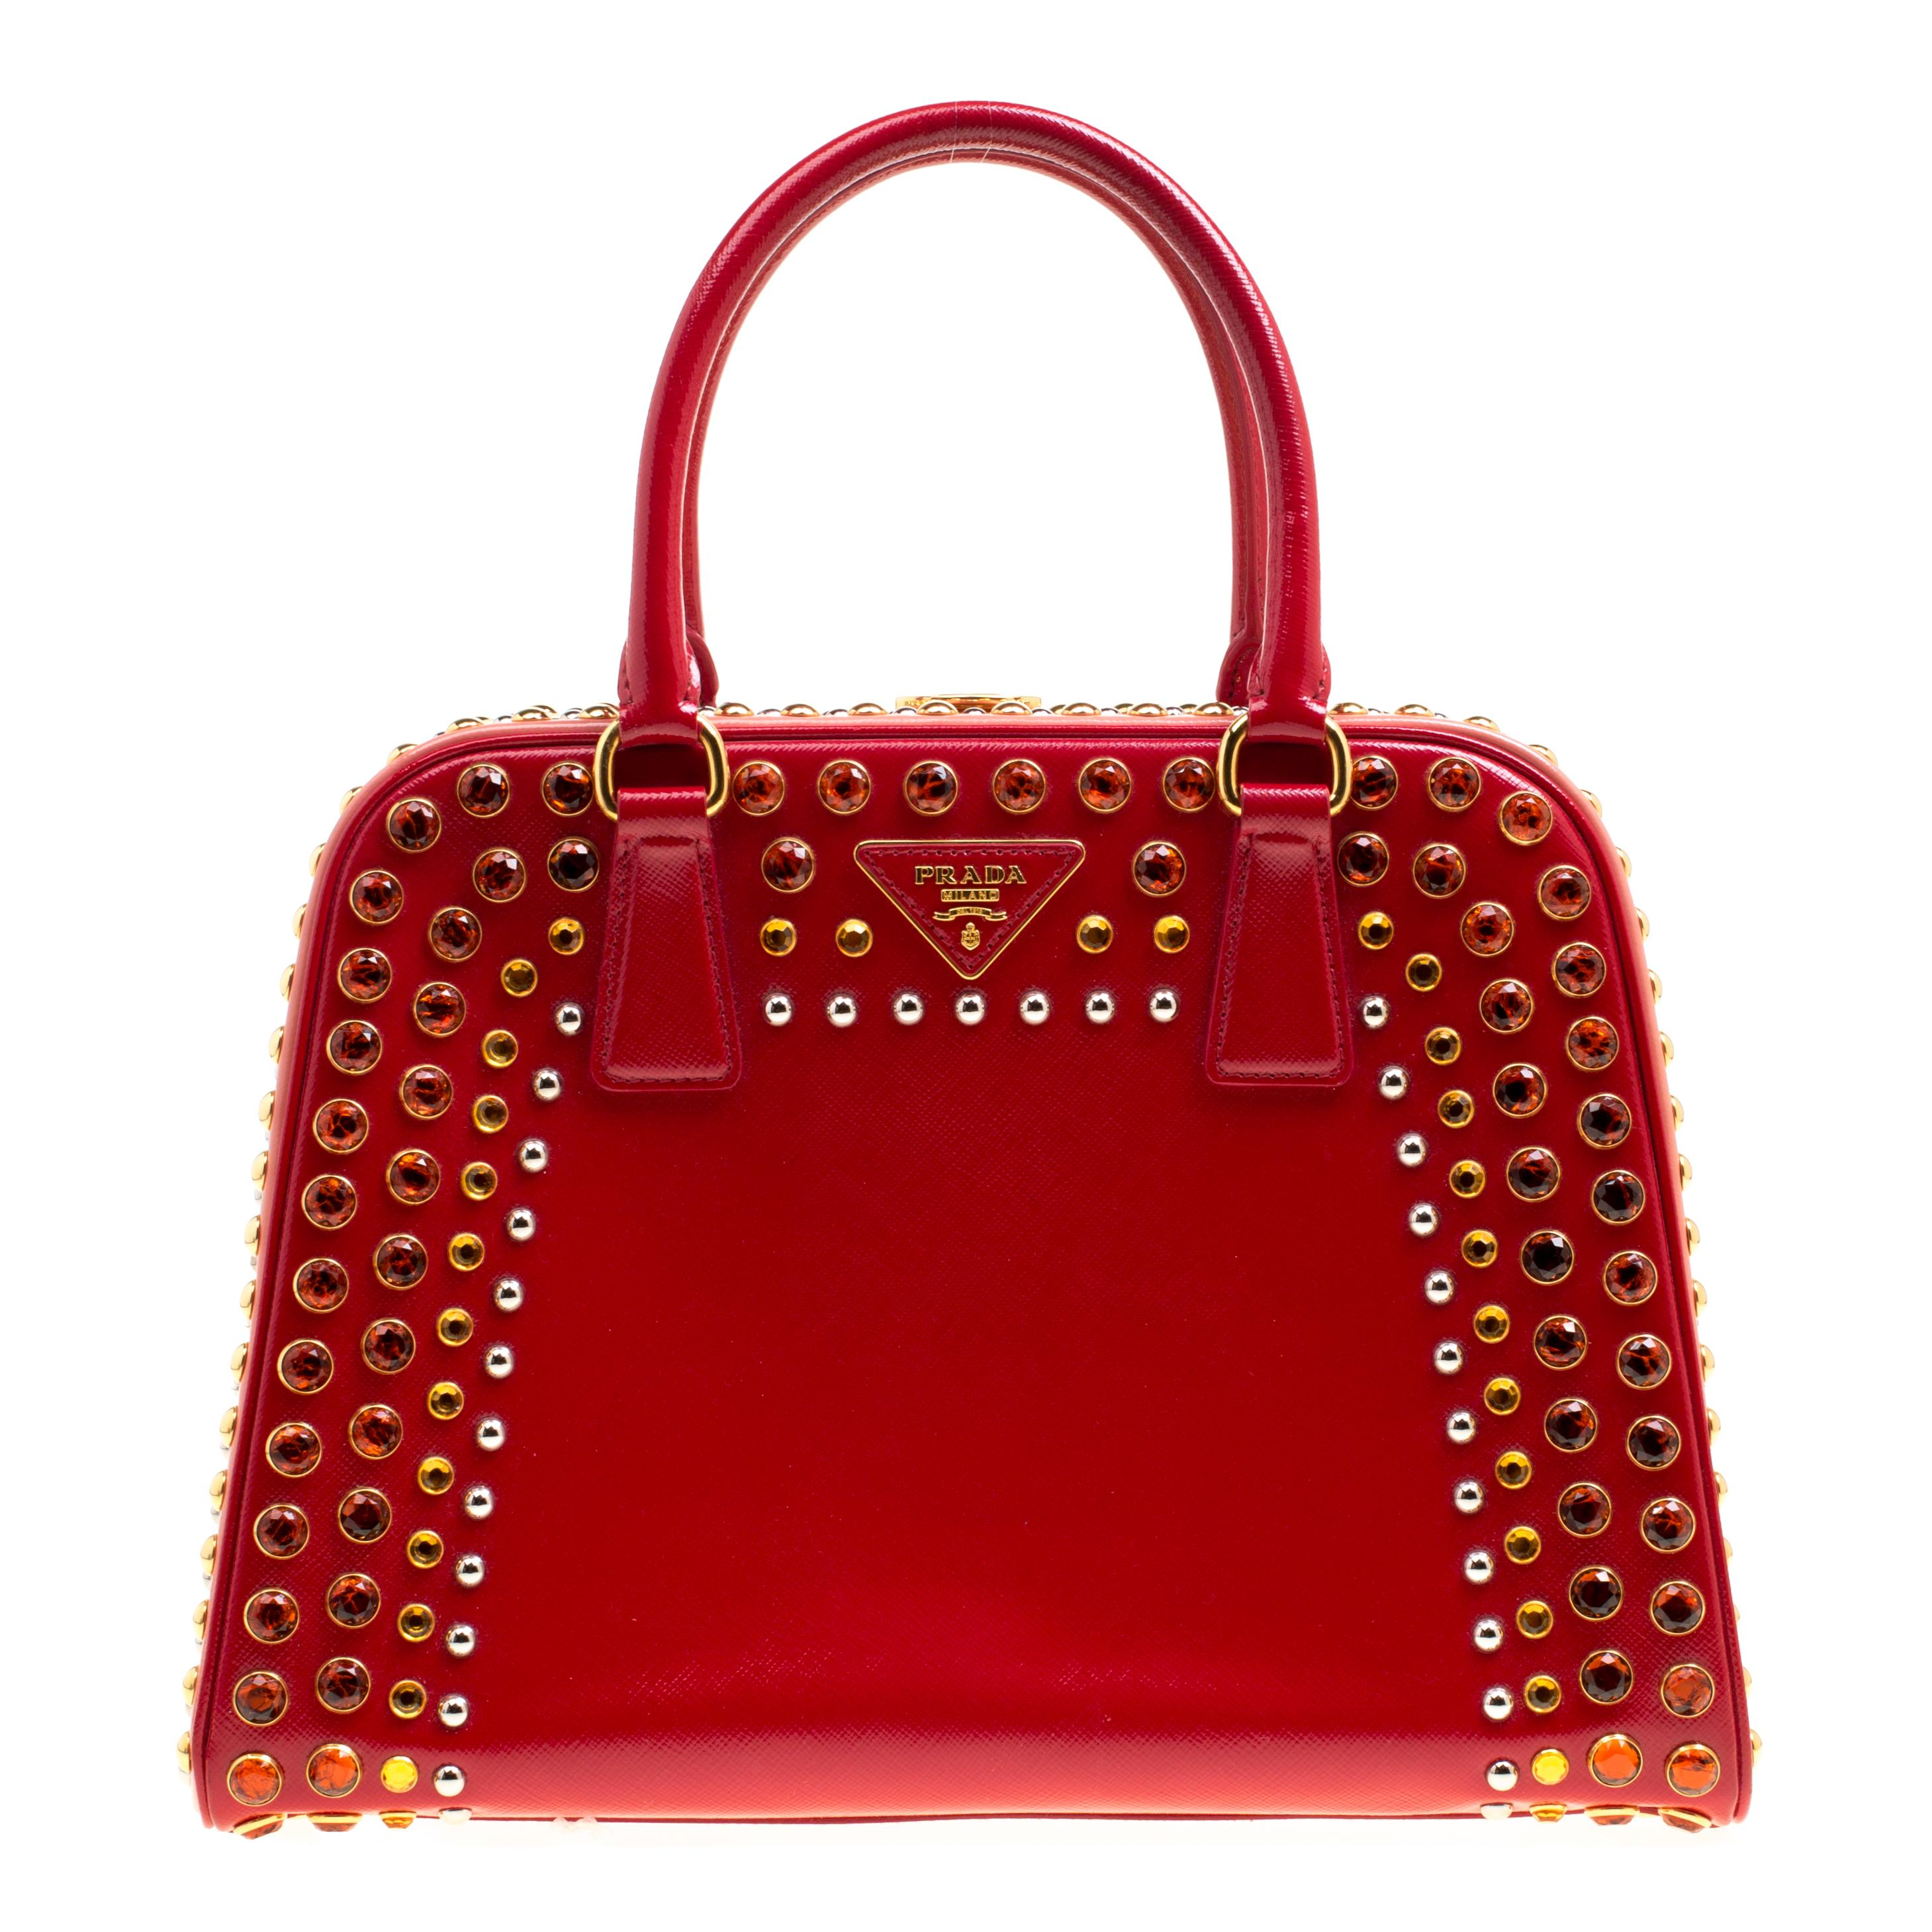 8370222b76c4 Prada Red Leather Handbag For Sale at 1stdibs